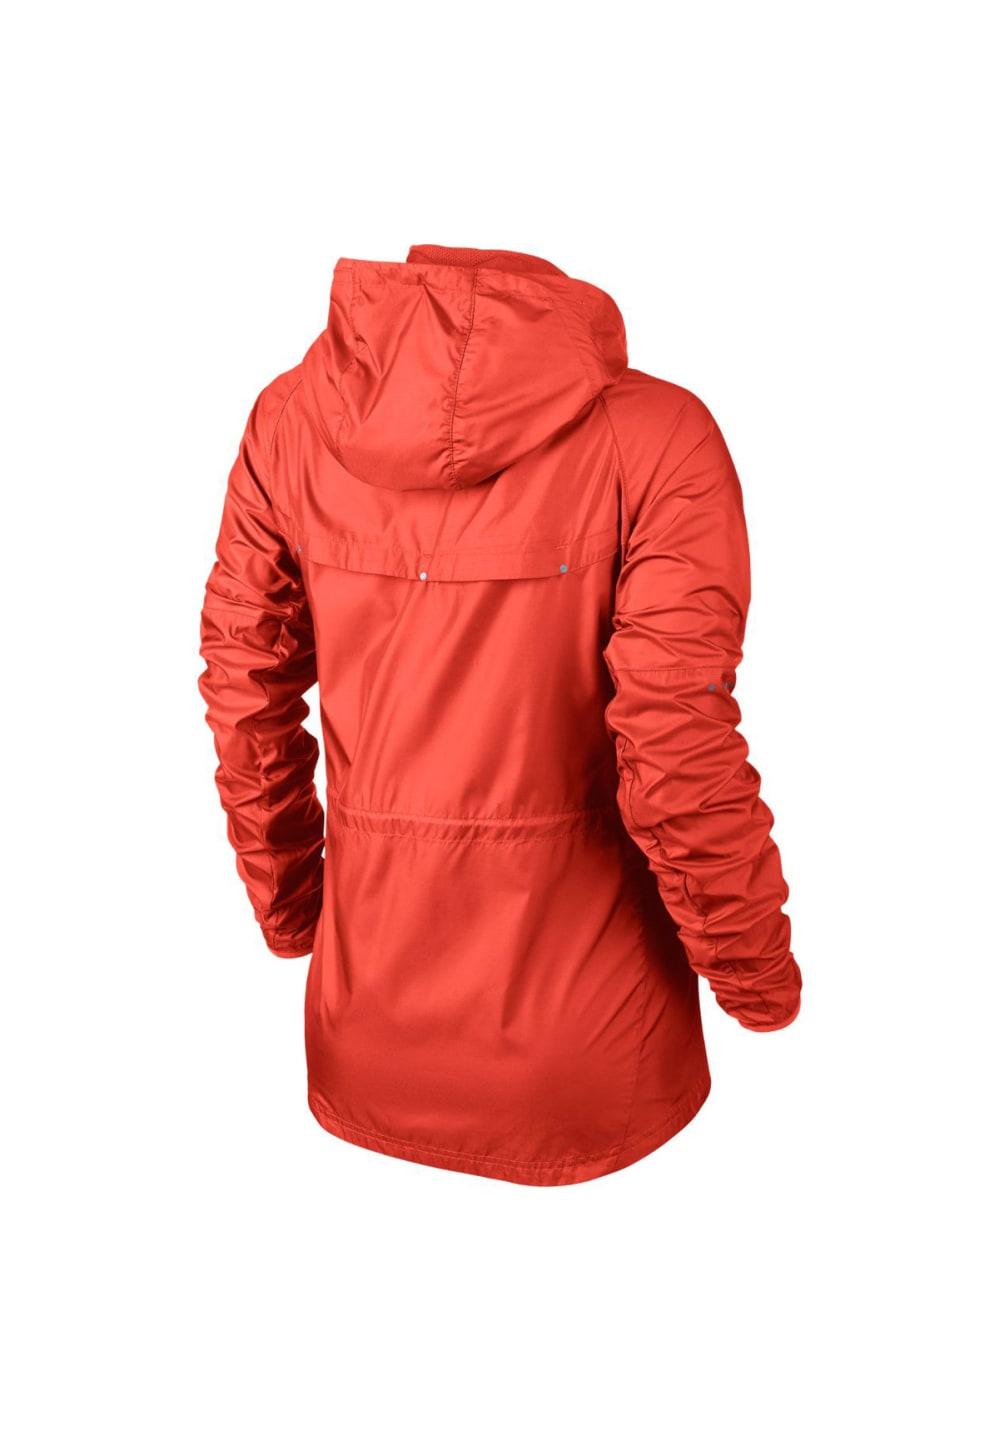 Vestes Xedobc Nike Femme Jacket Course Vapor Pour Rouge21run PkXwiOZTu